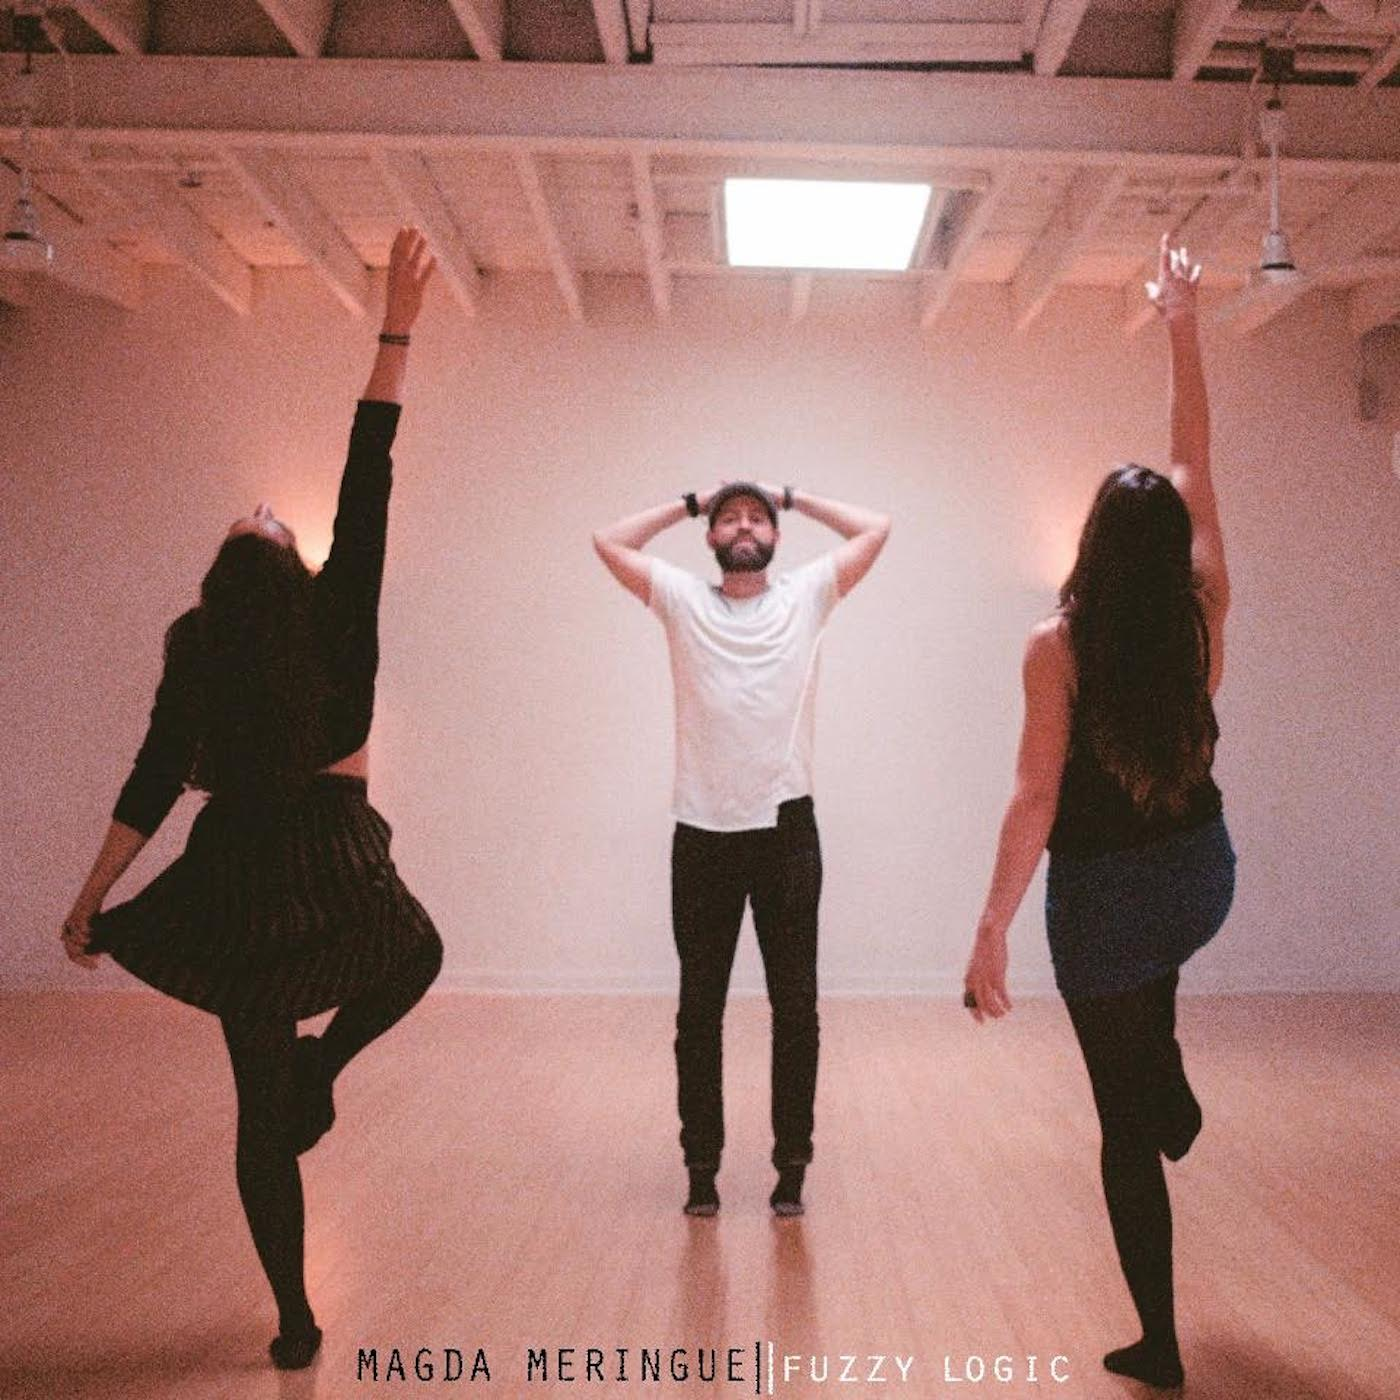 Fuzzy Logic Album Cover Art